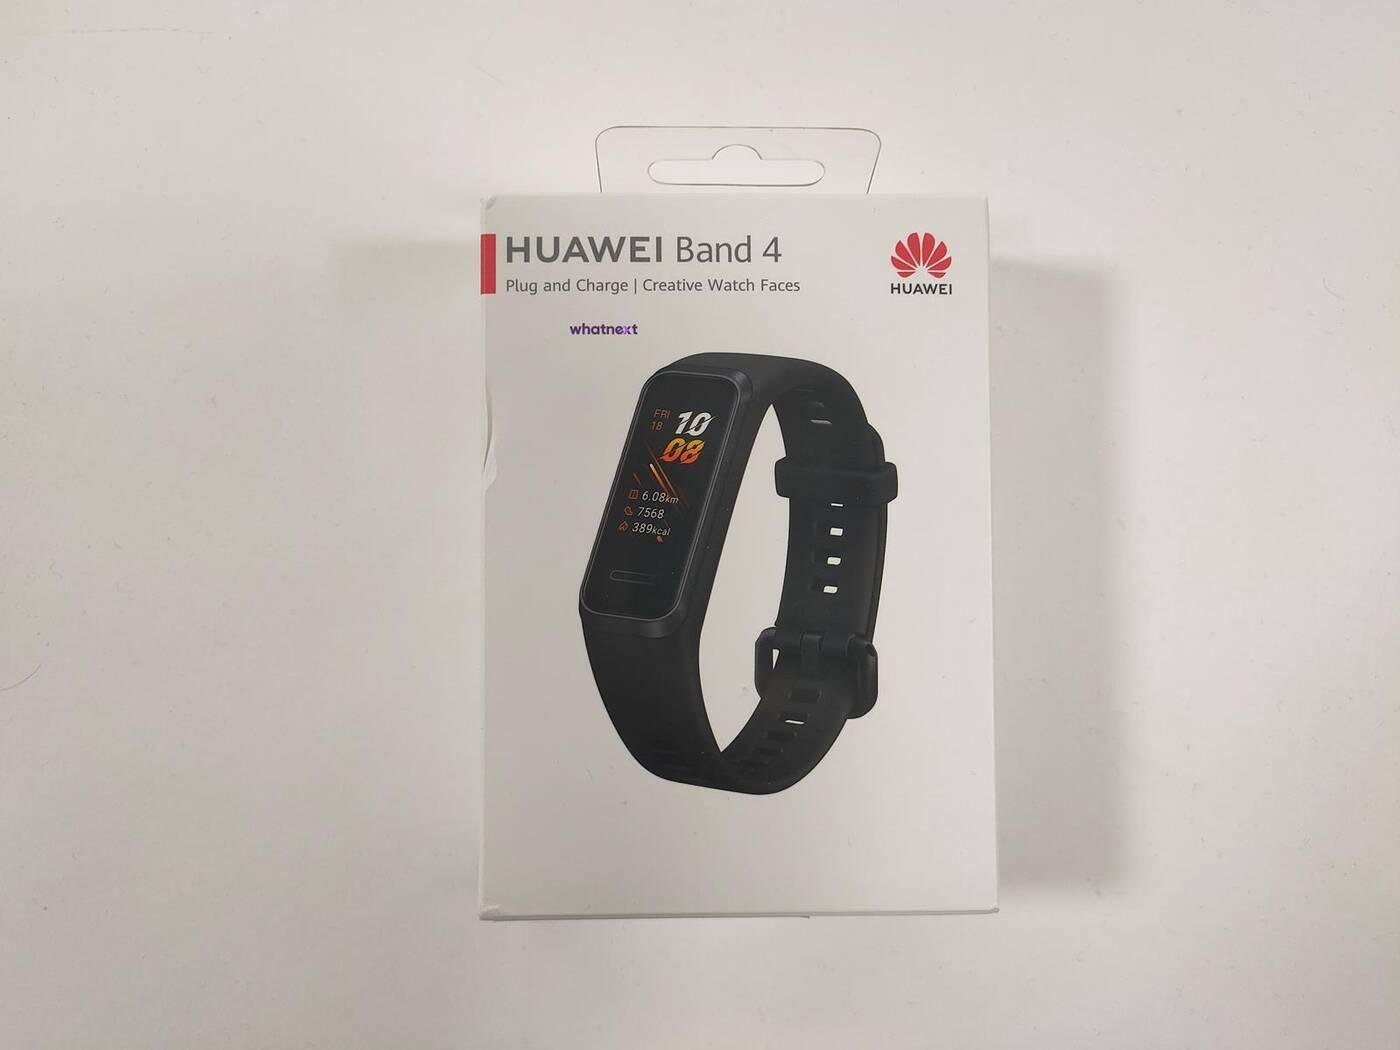 test Huawei Band 4, recenzja Huawei Band 4, review Huawei Band 4, opinia Huawei Band 4, cena Huawei Band 4